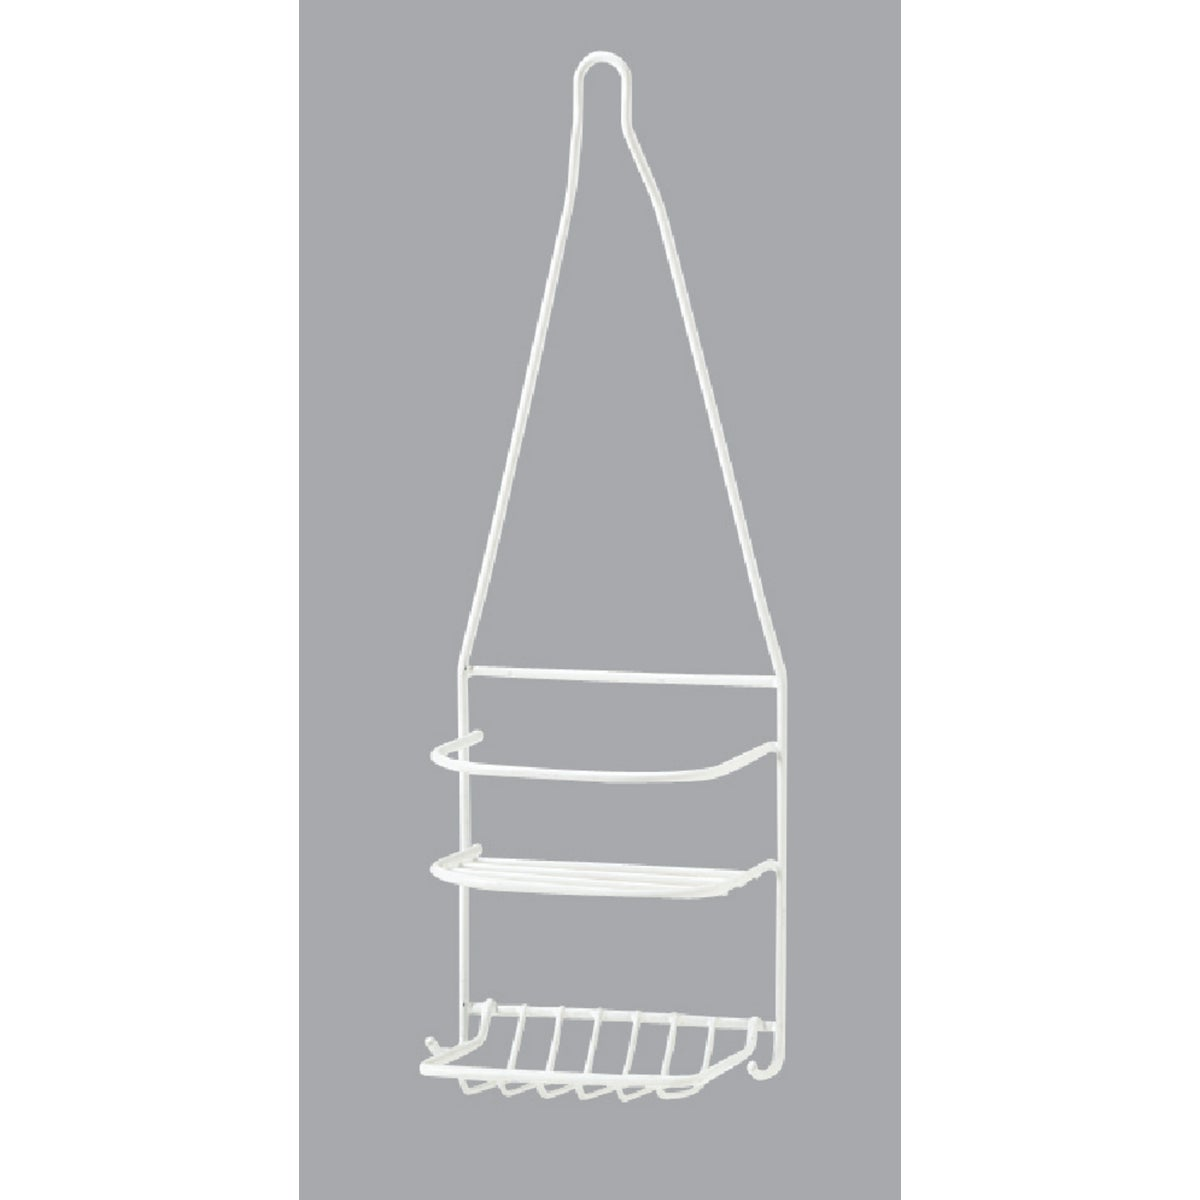 Holmz-Selfix SMALL SHOWER ORGANIZER 21510301.36